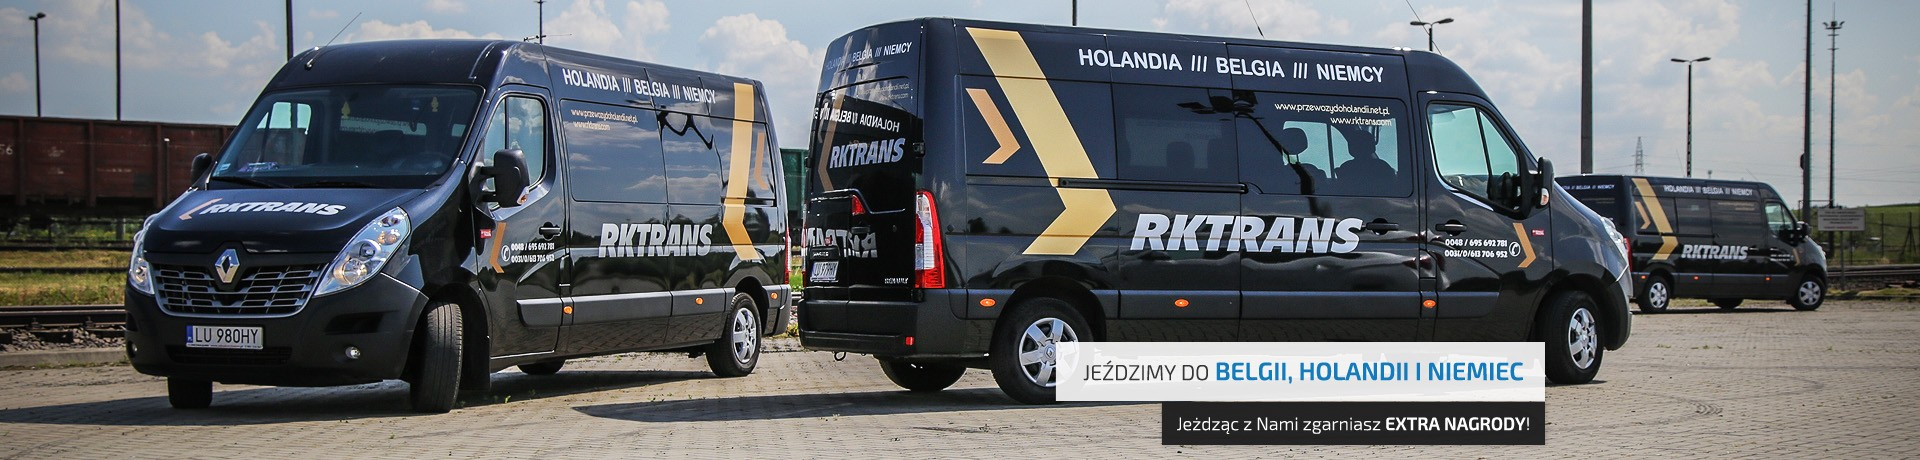 busy rktrans do Belgii, Holandii i Niemiec